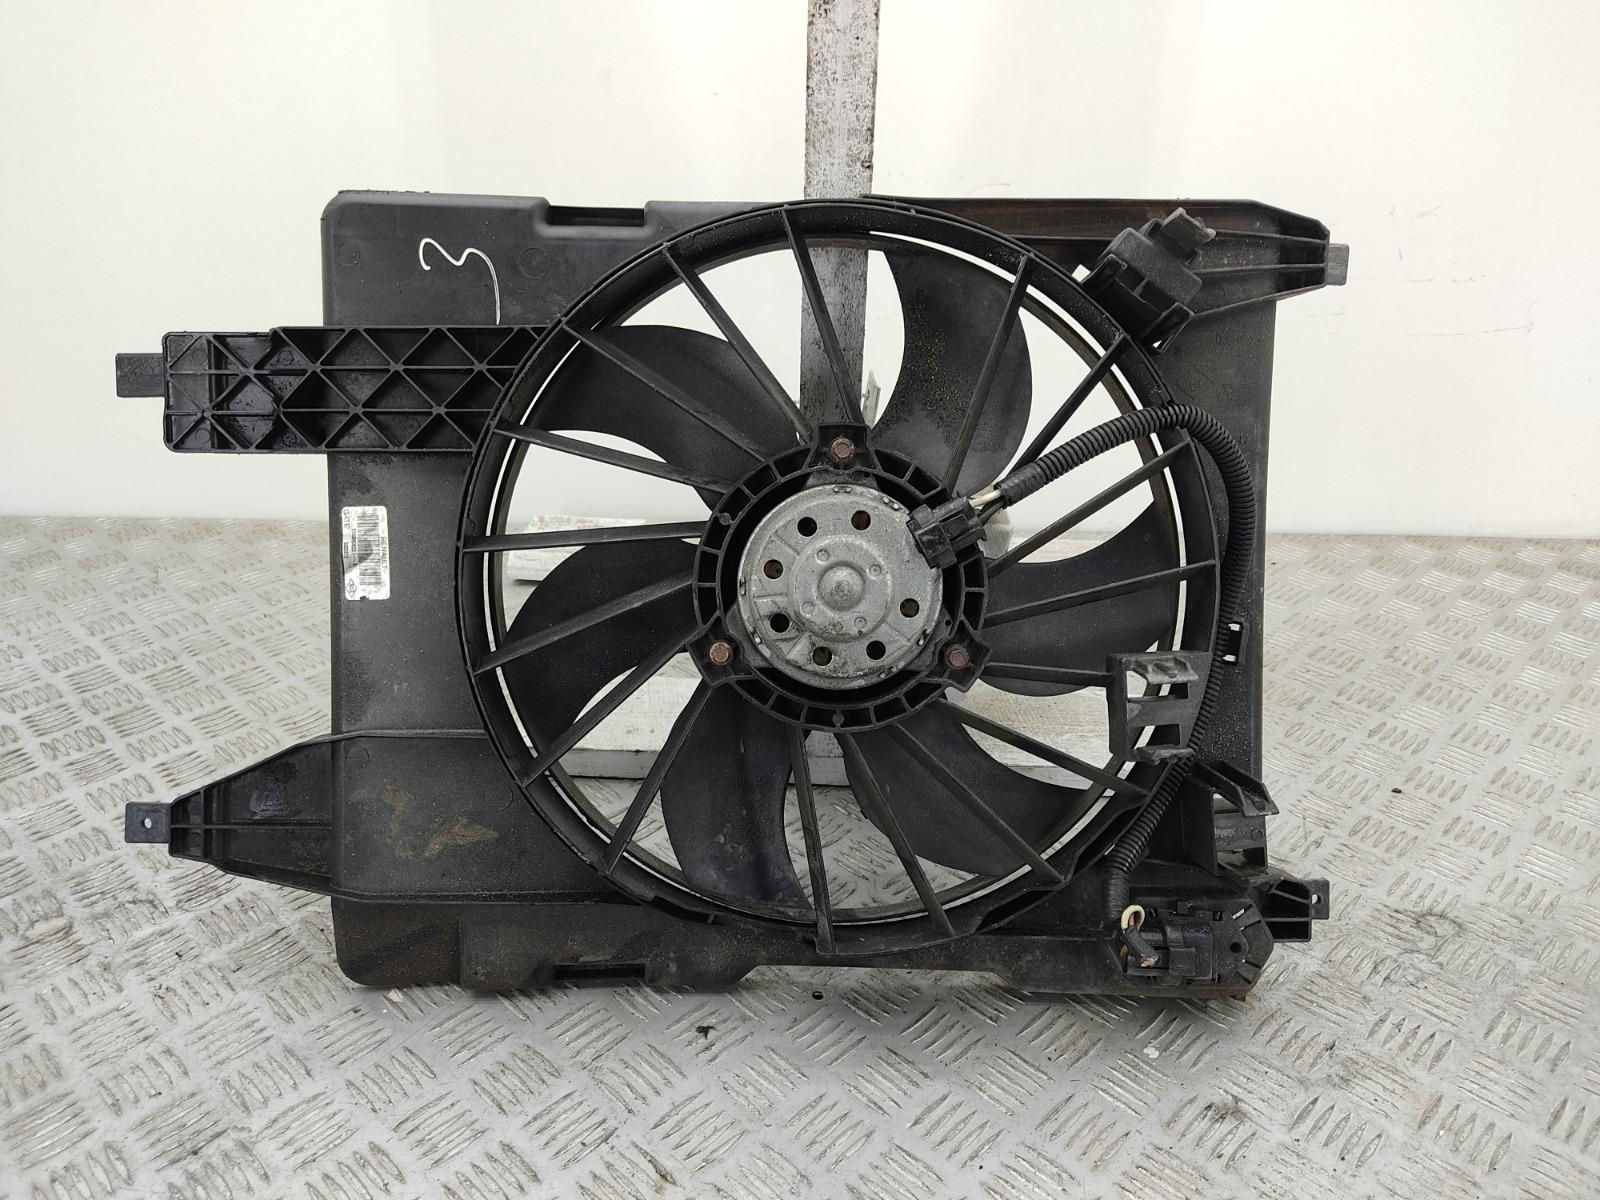 Вентилятор радиатора Renault Megane 1.6 I 2008 (б/у)